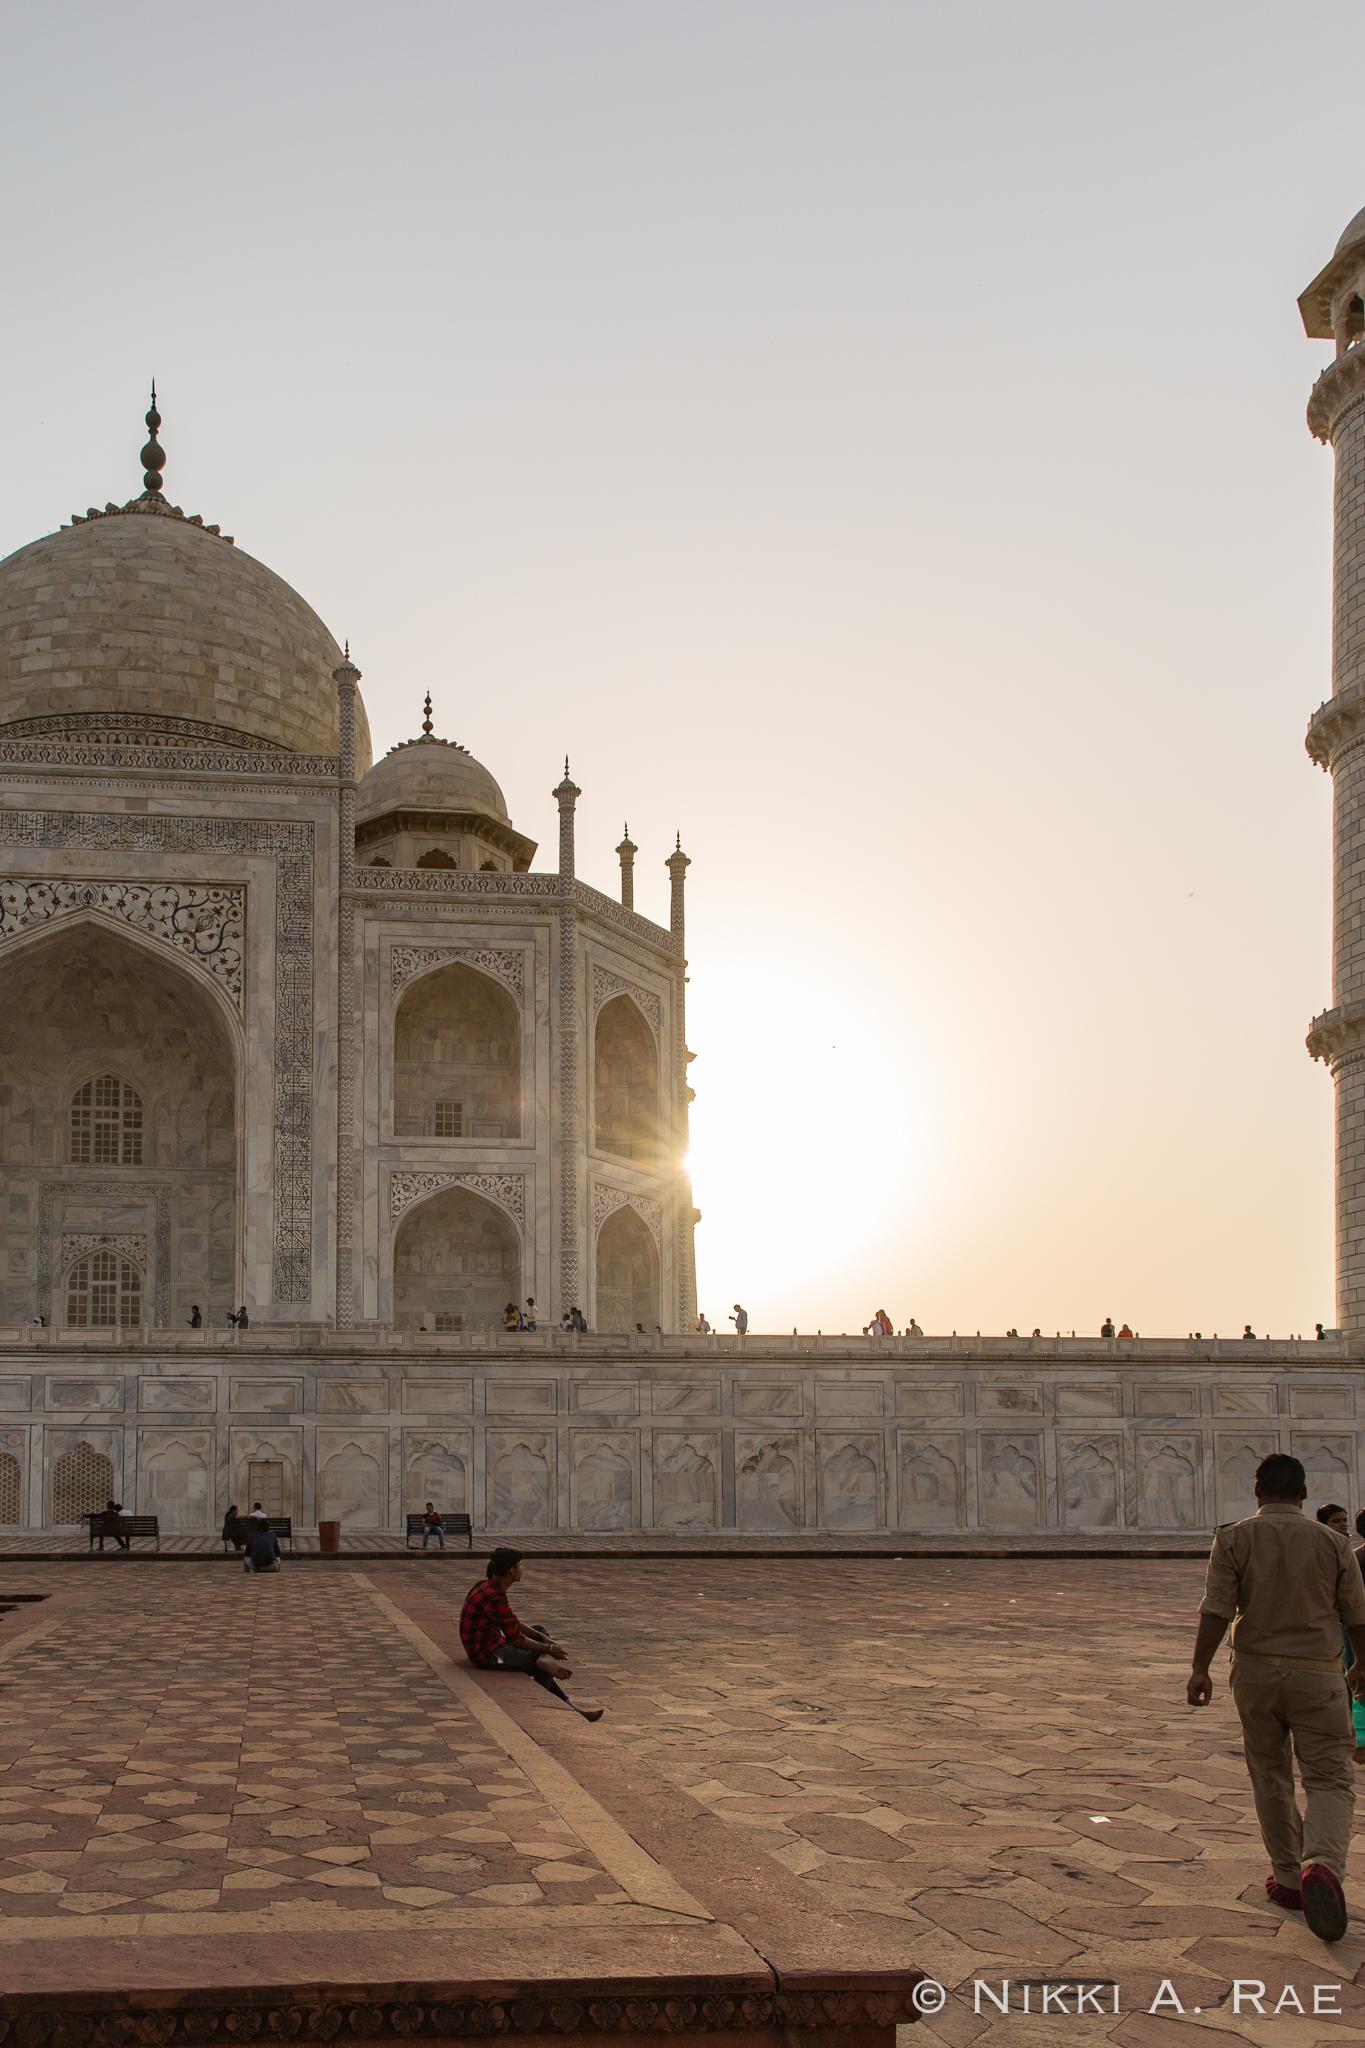 Agra Intrepid 05.20.2017-26.jpg